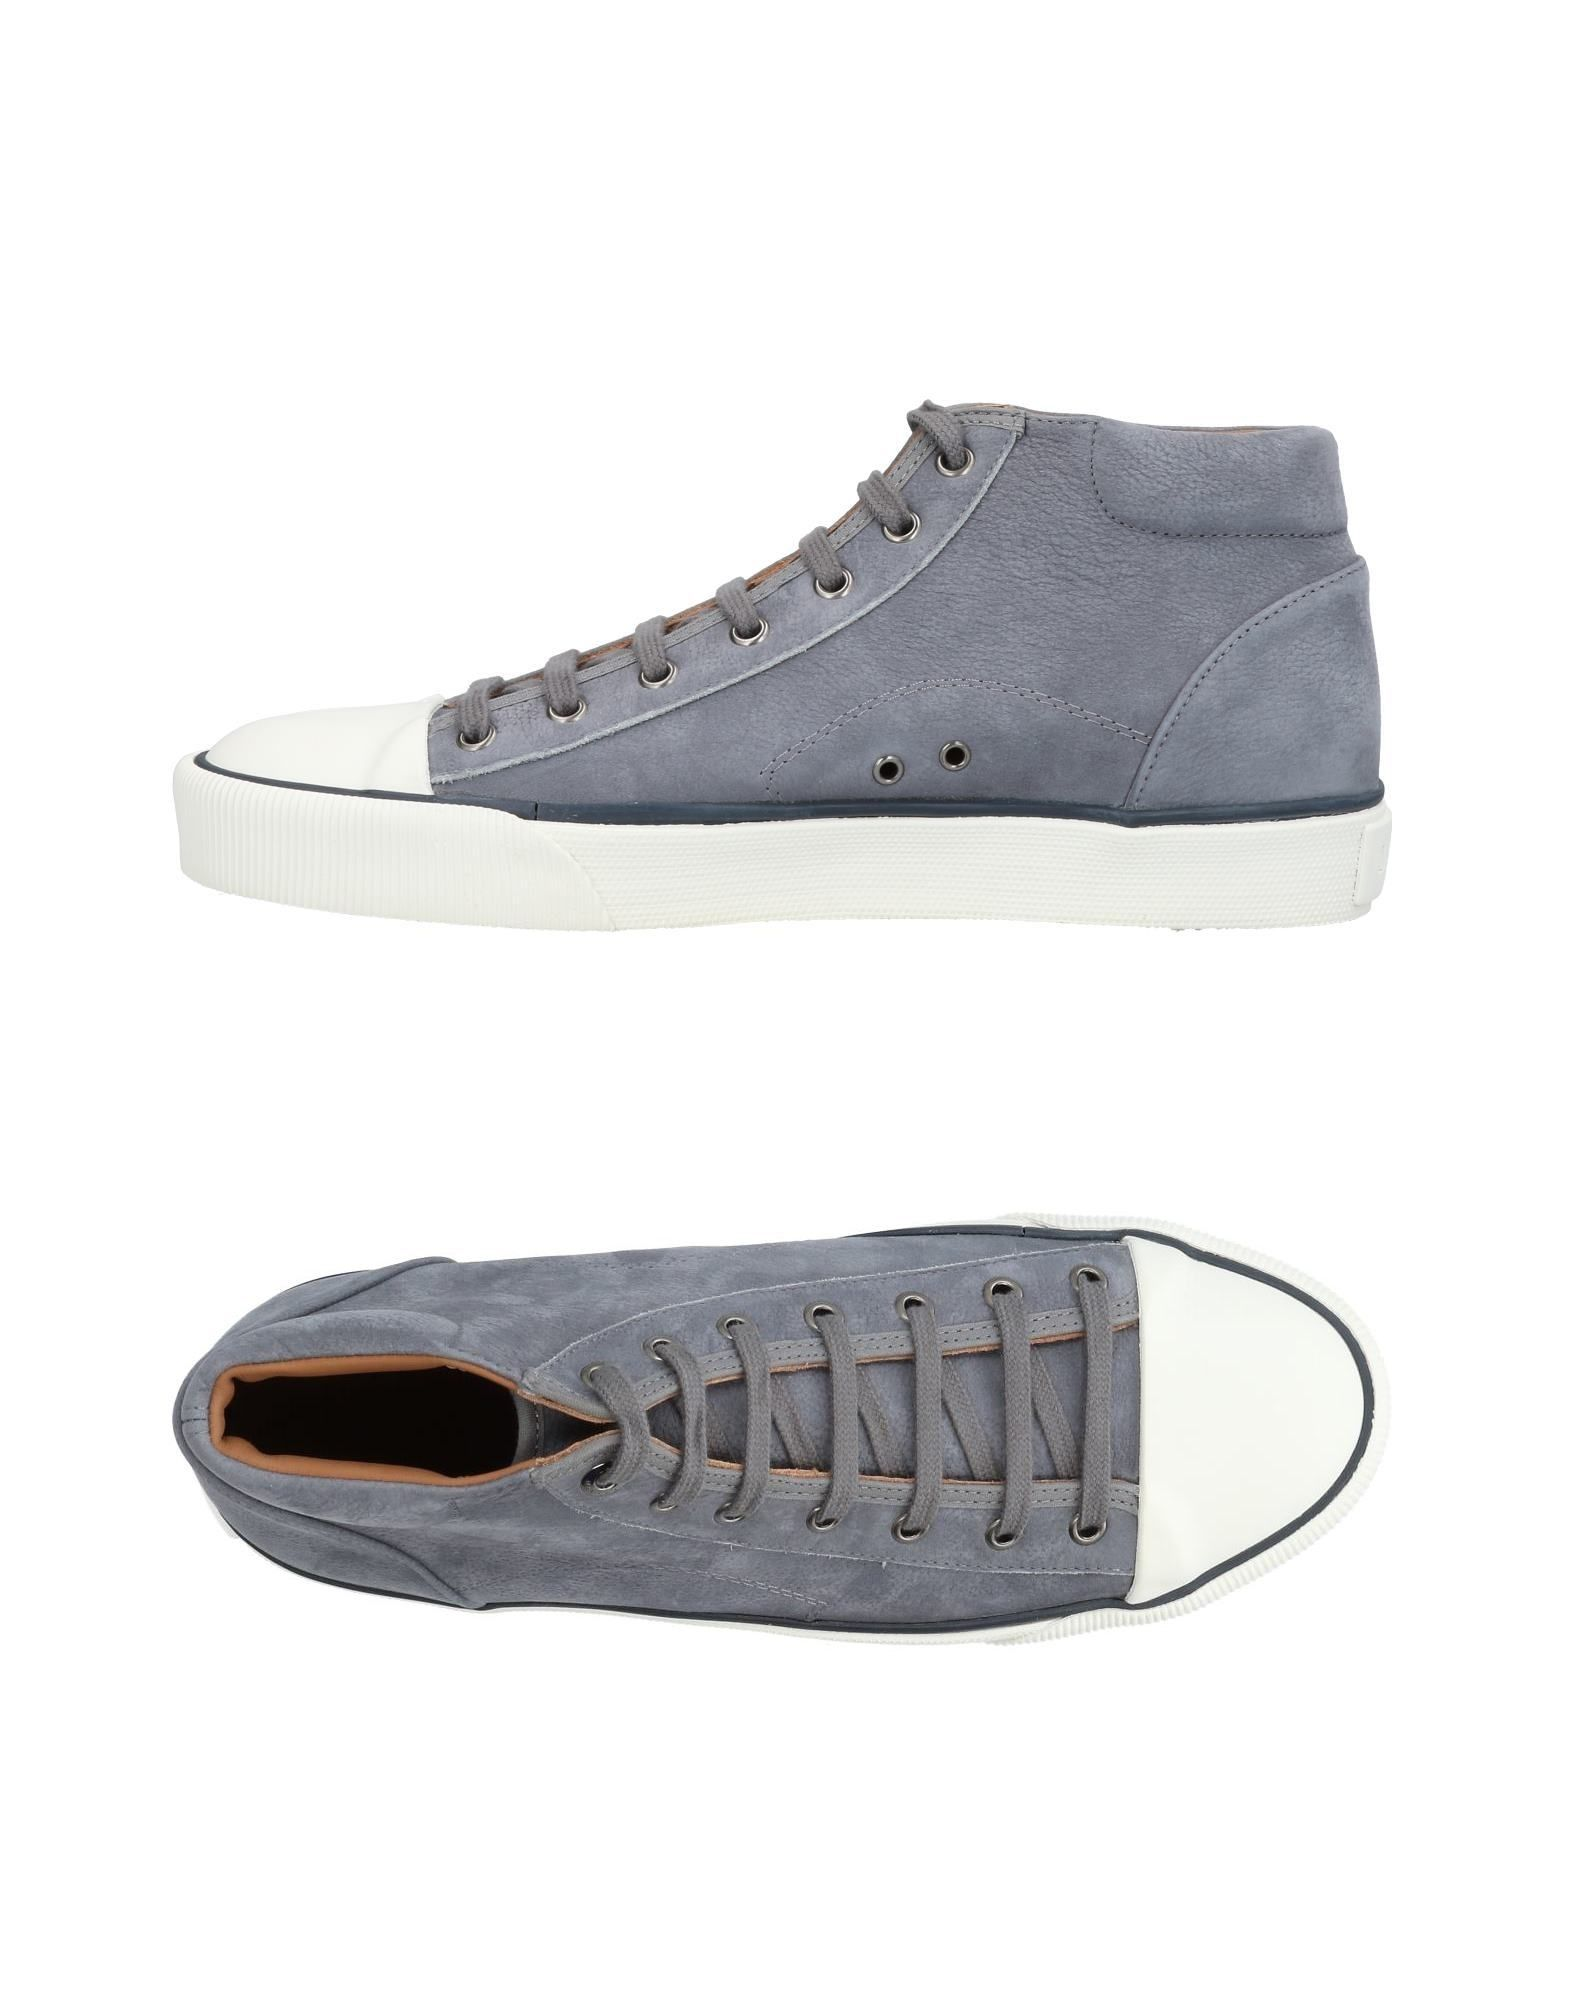 Lanvin Sneakers Herren  11216502GU Gute Qualität beliebte Schuhe